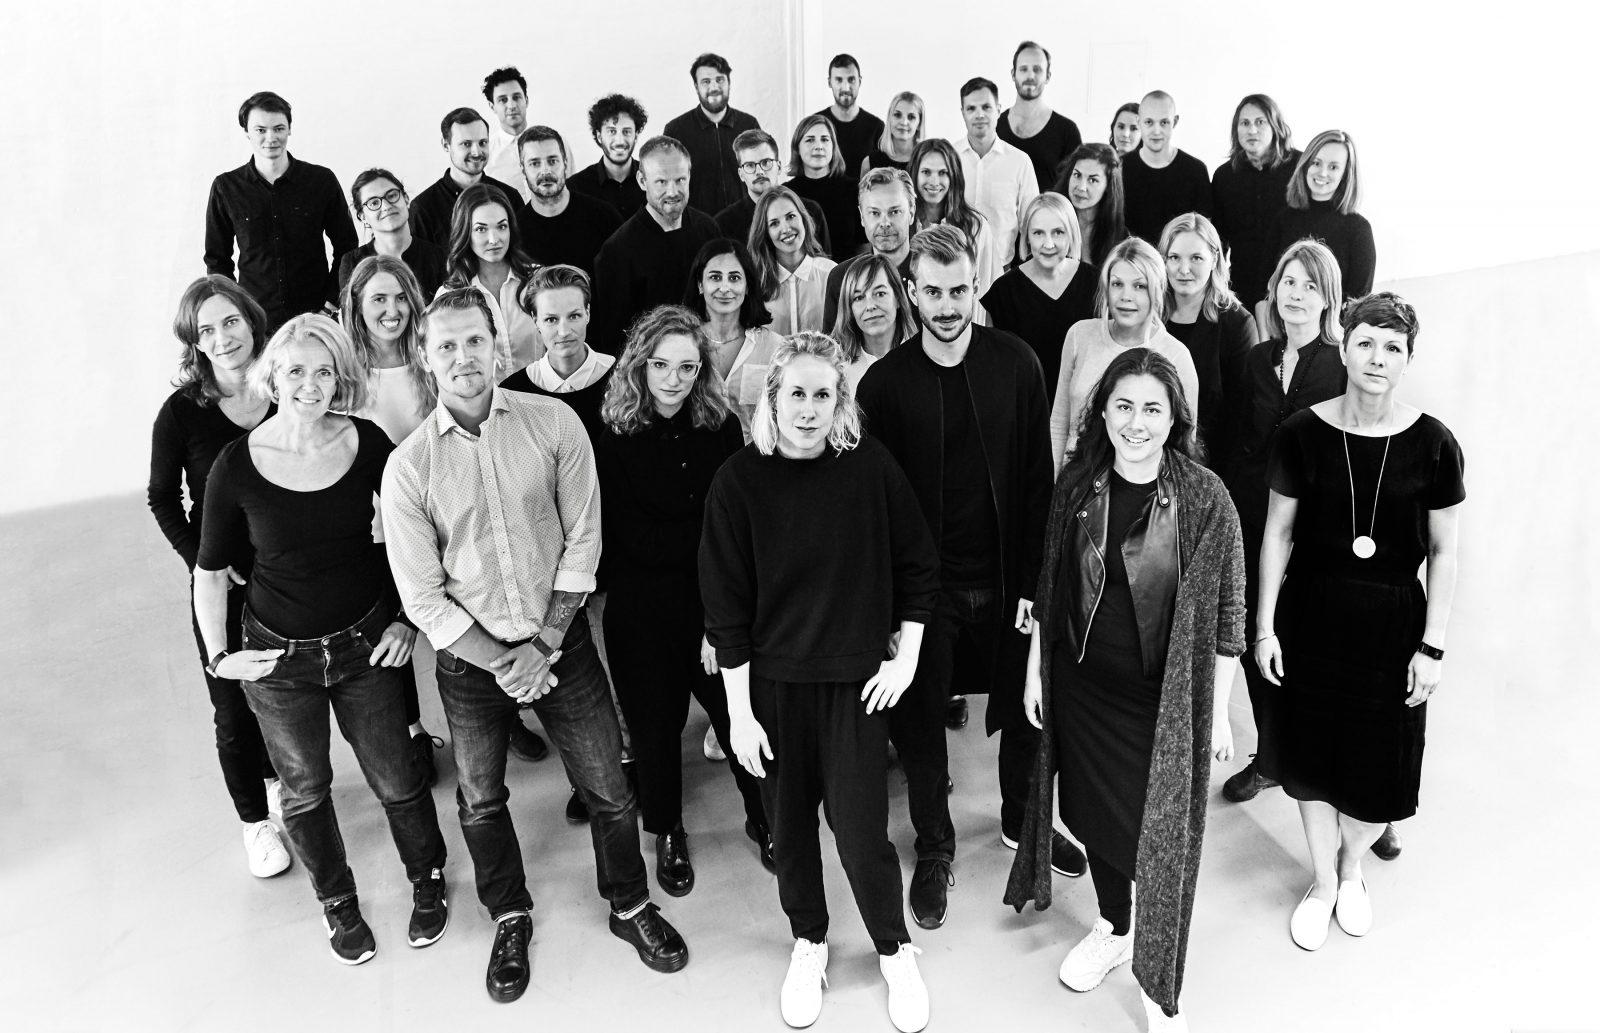 KjellanderSjoberg Team ©MikaelOlsson